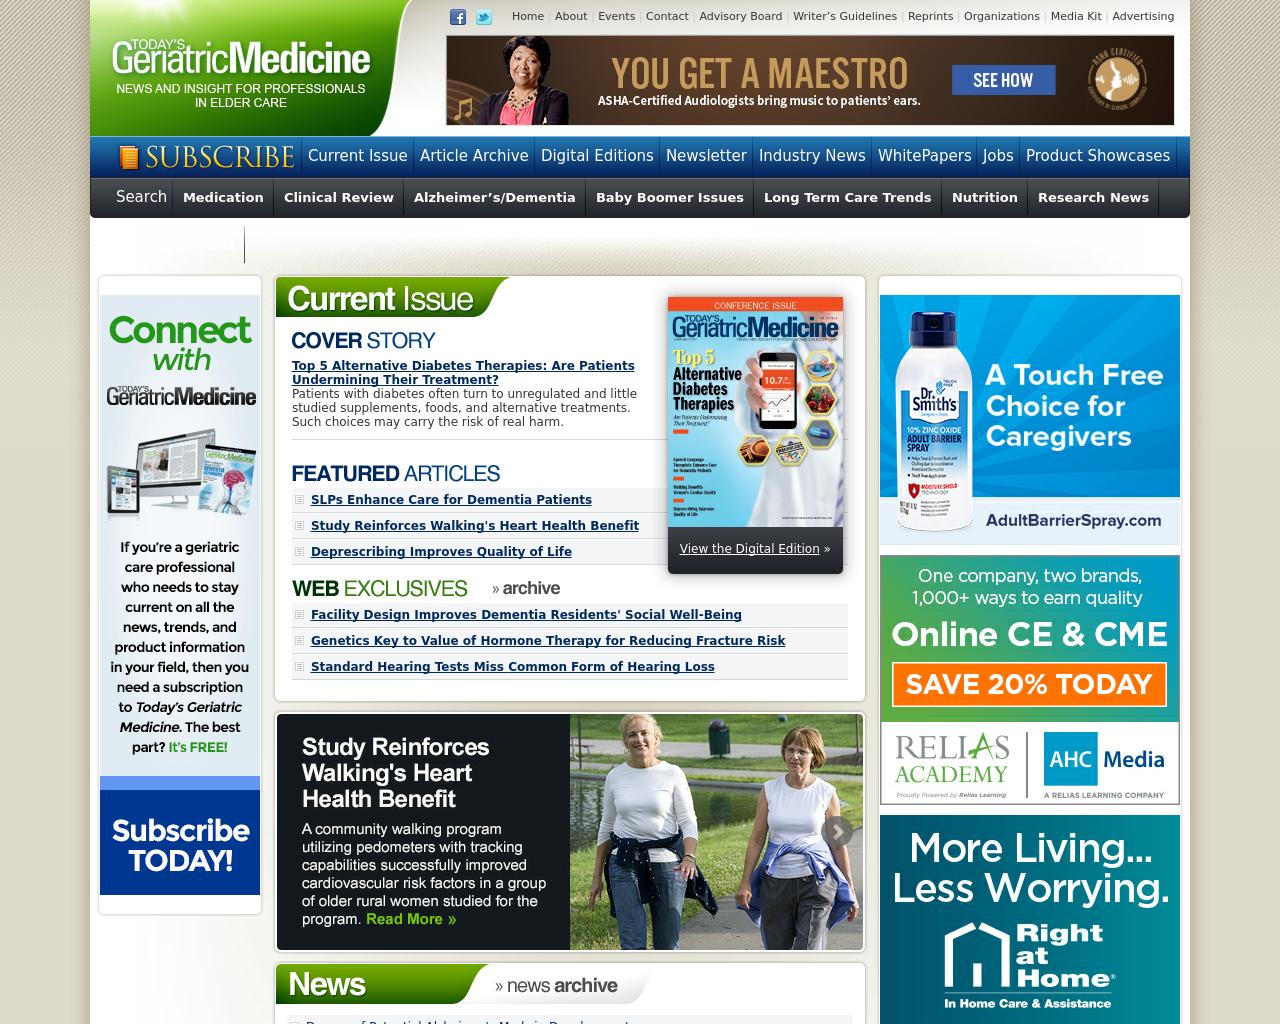 Today's-Geriatric-Medicine-Advertising-Reviews-Pricing